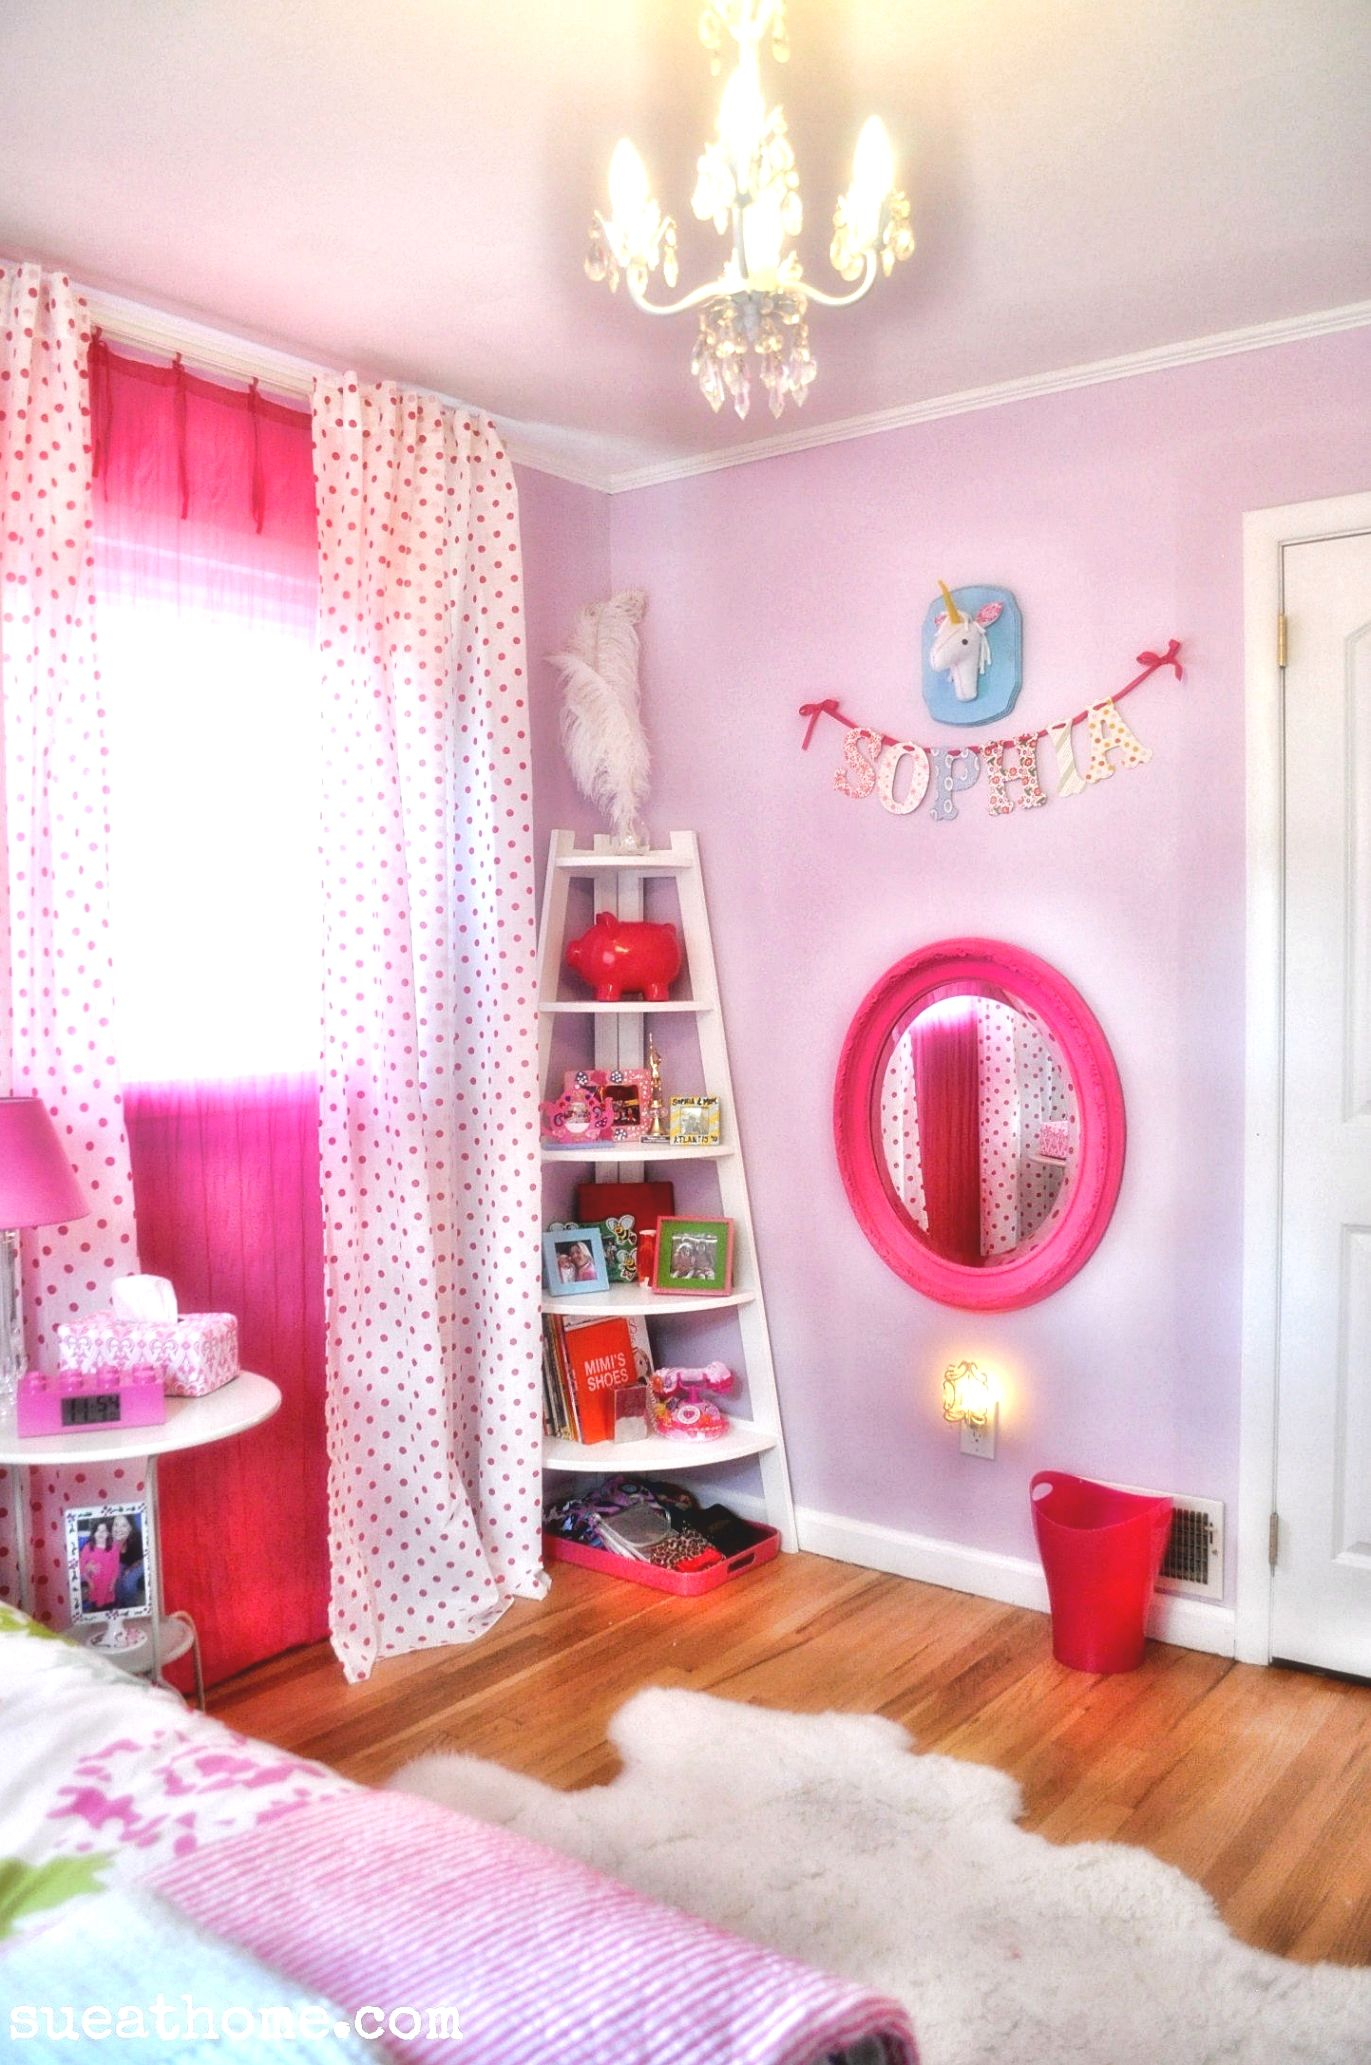 Girl Bedroom Remodel Ideas Eliminate Clutter To Help Make Your Rooms Feel Bigger Consider Re Kids Bedroom Designs Interior Decoration Bedroom Bedroom Design